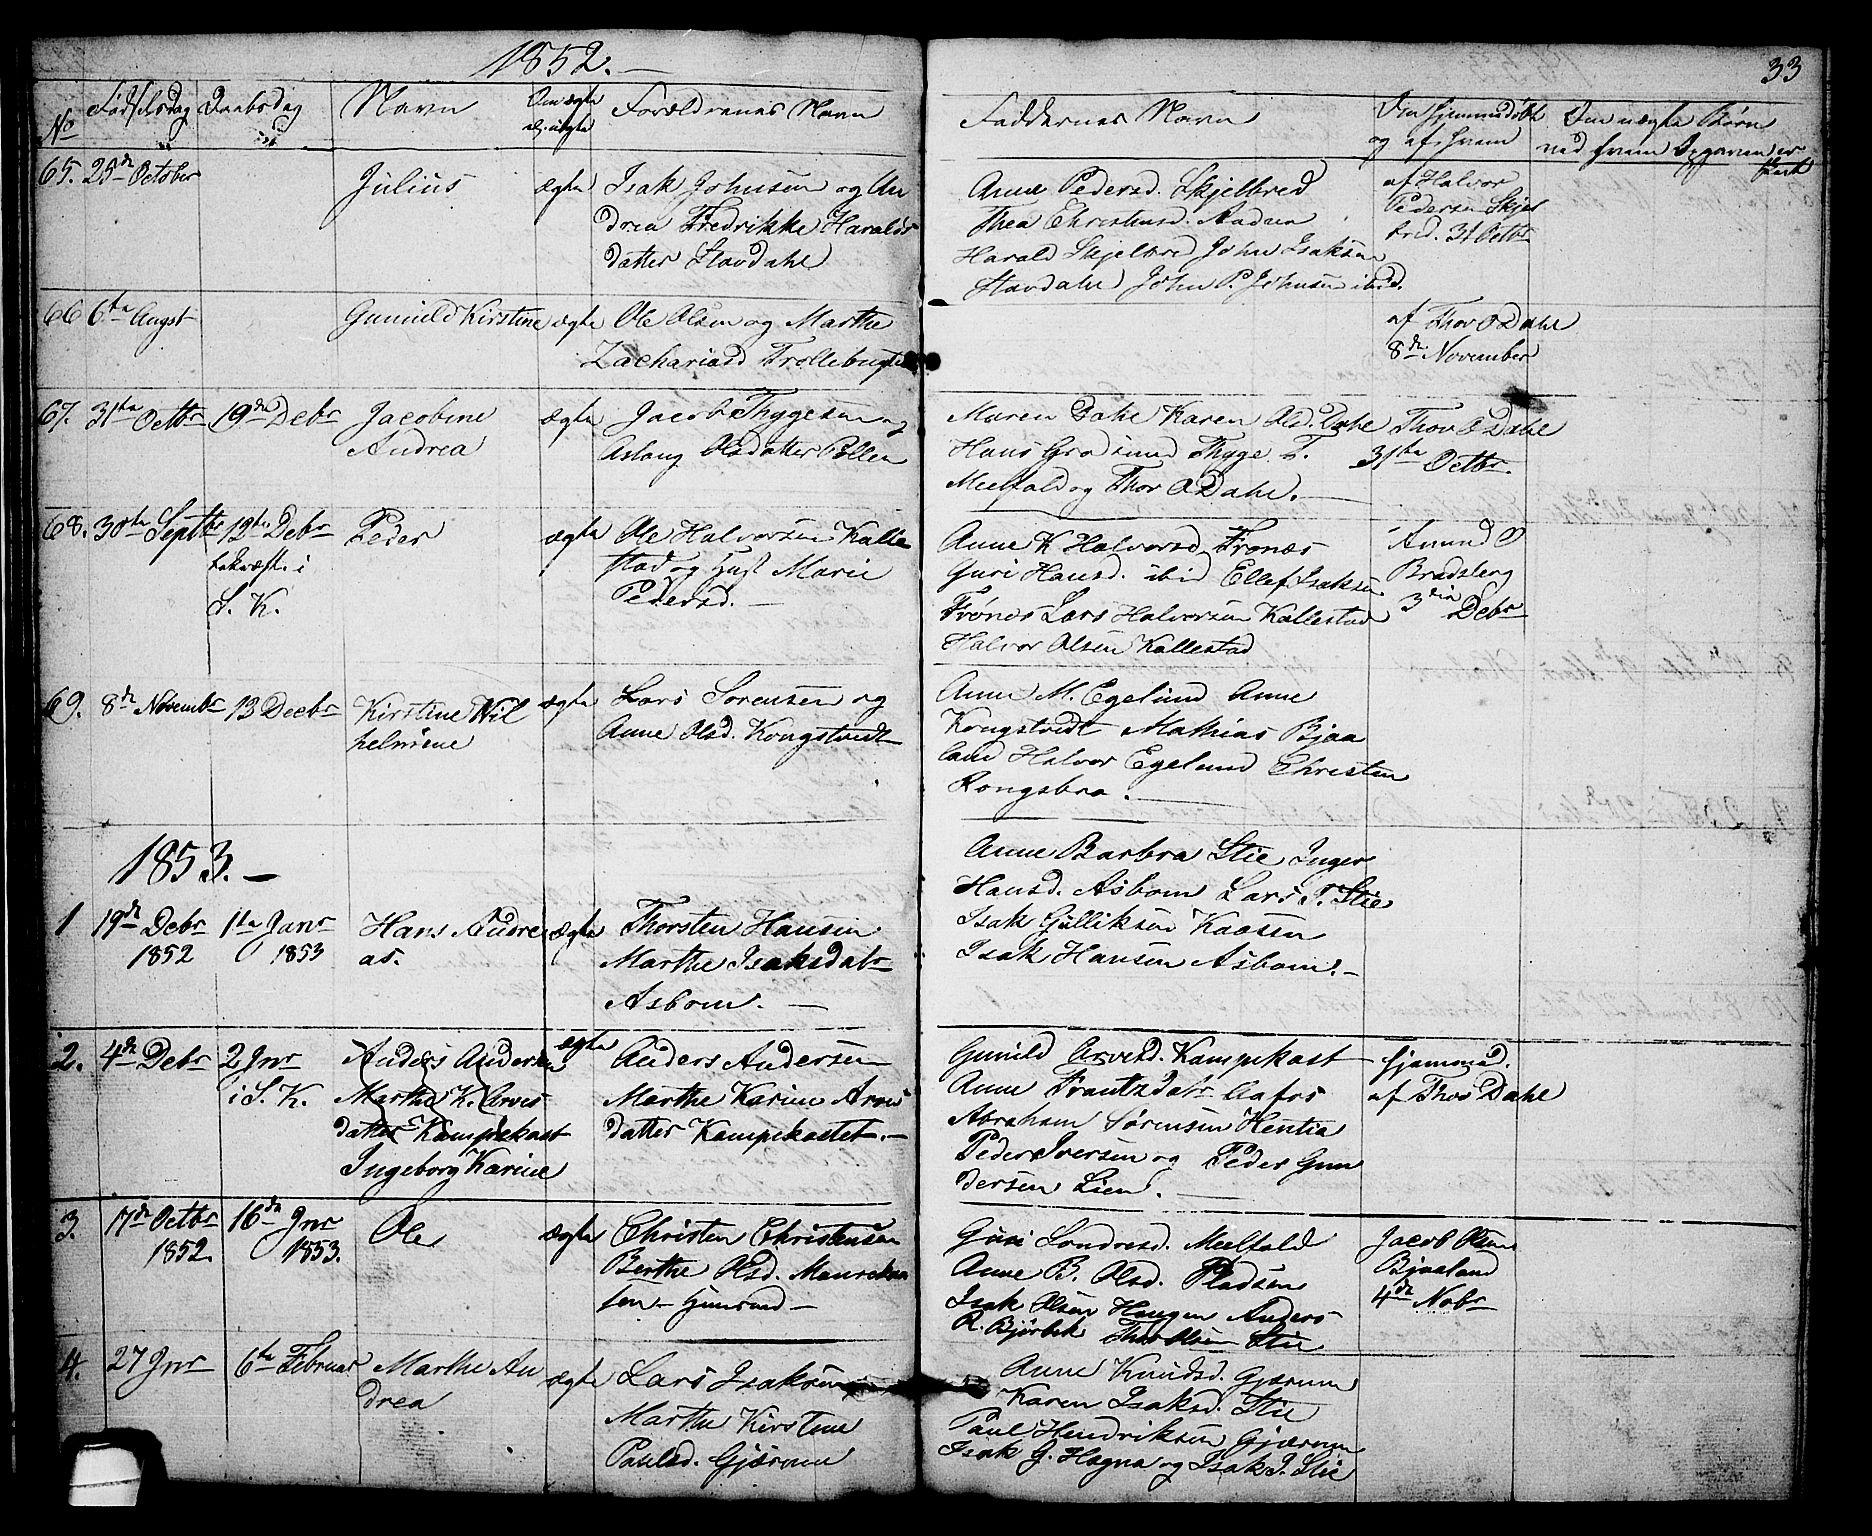 SAKO, Solum kirkebøker, G/Gb/L0001: Klokkerbok nr. II 1, 1848-1859, s. 33